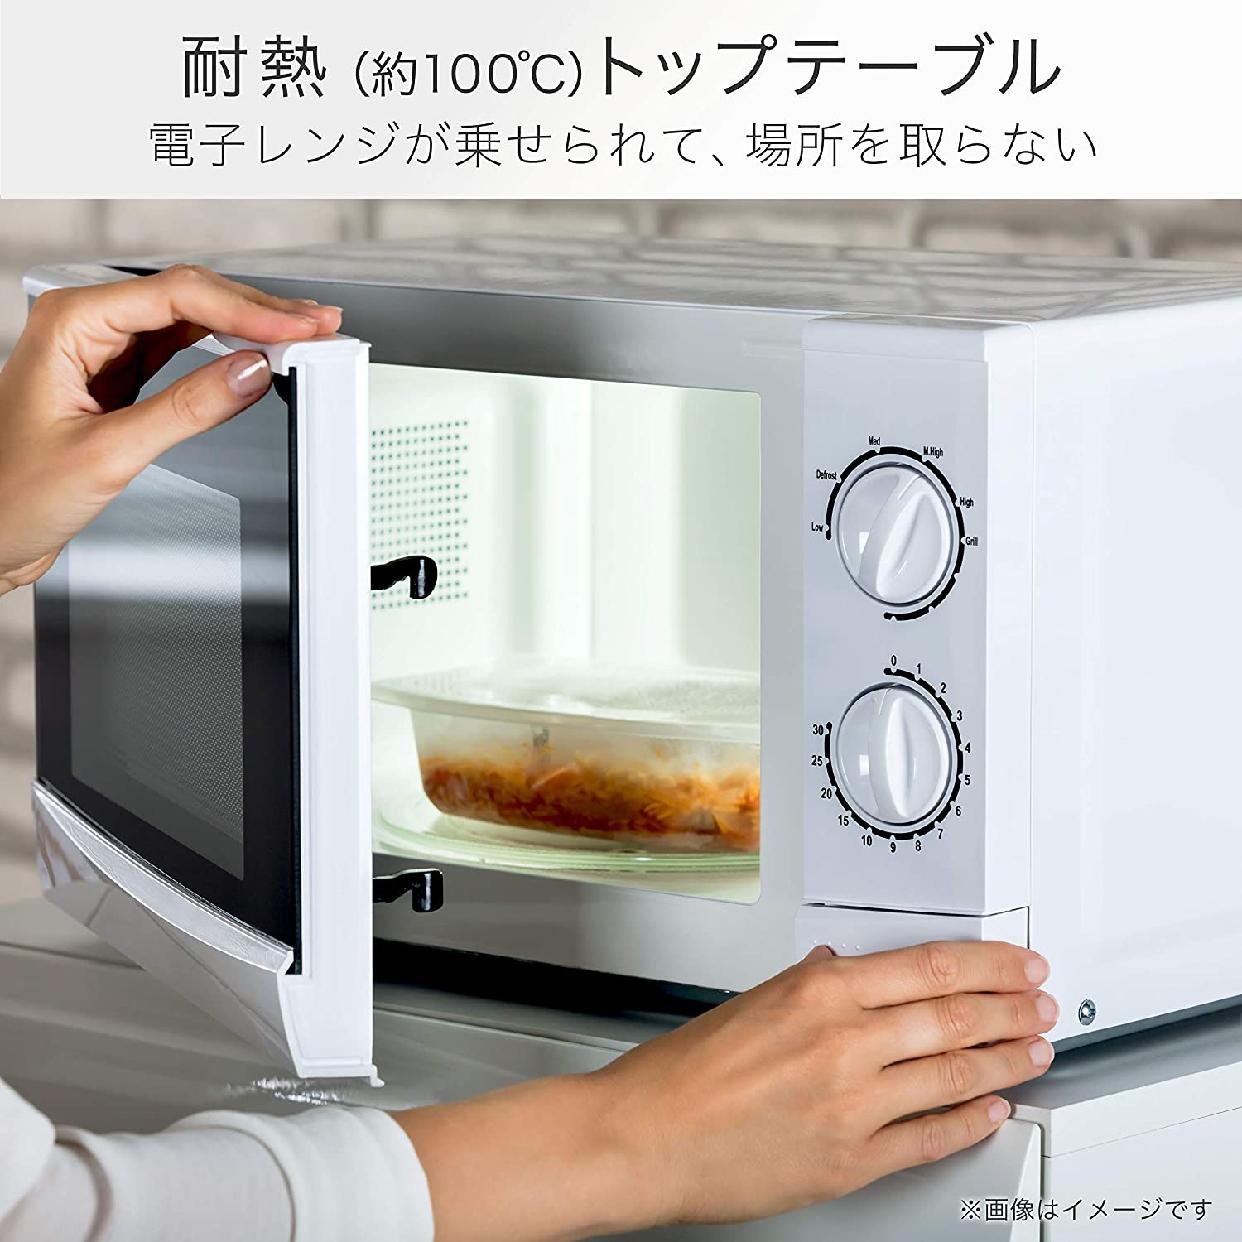 Hisense(ハイセンス)150L 冷凍冷蔵庫 HR-D15Cの商品画像4